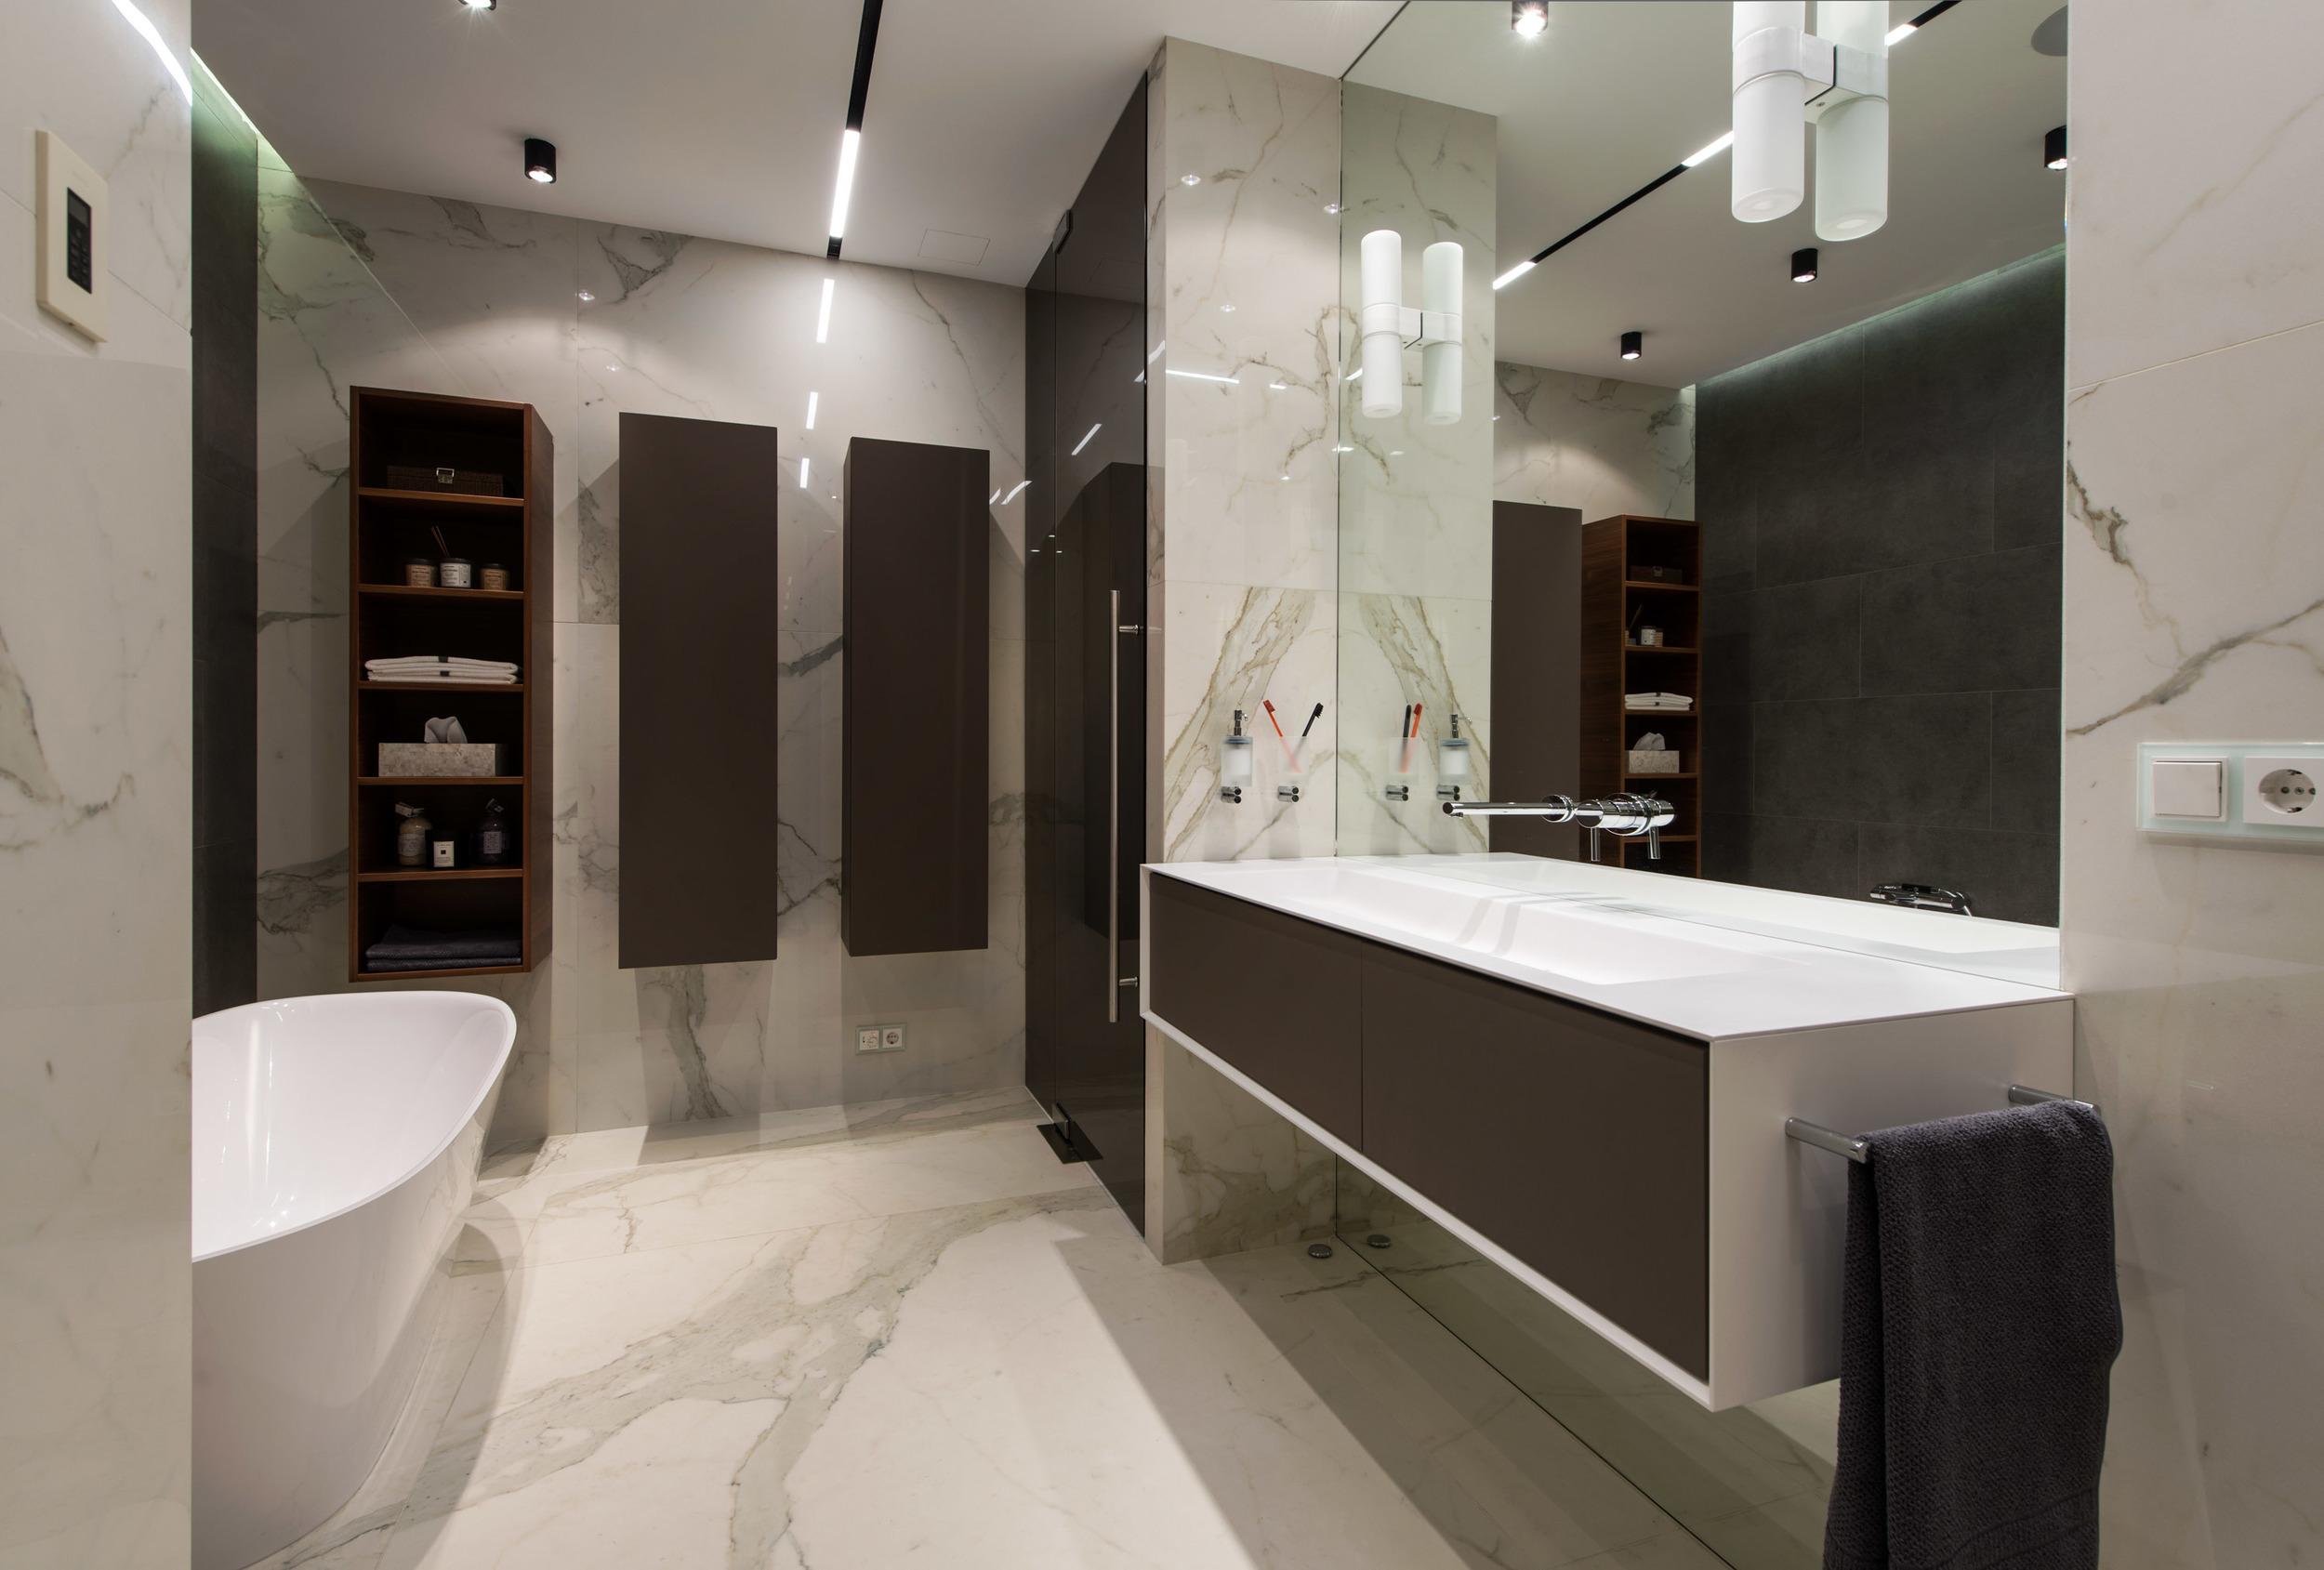 17_Match Architects_master bathroom.jpg